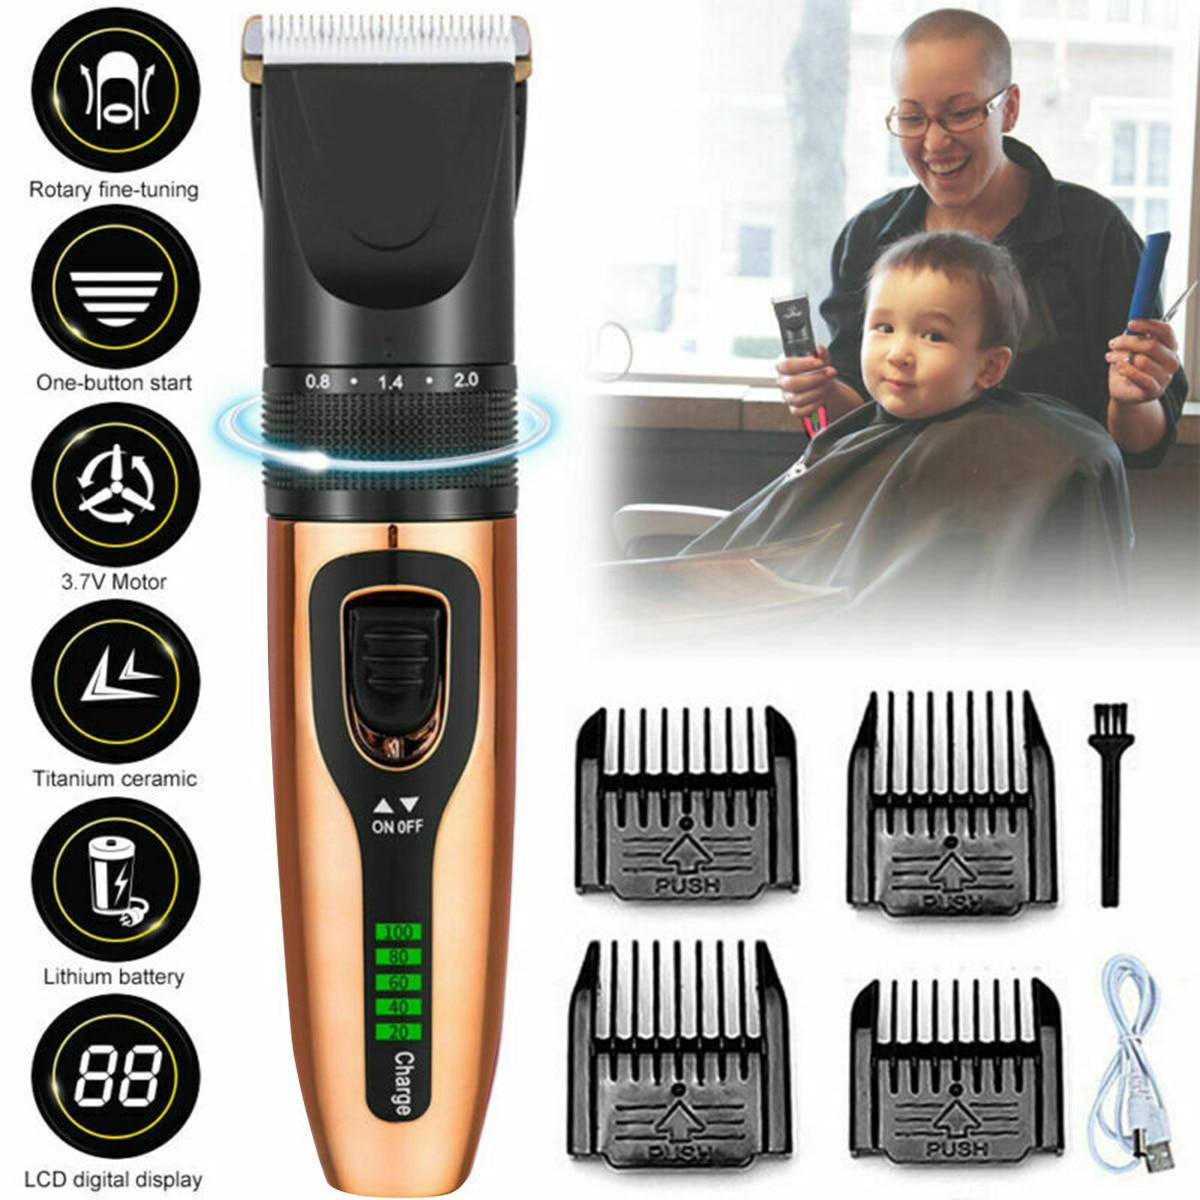 Professional Digital Hair Trimmer Rechargeable Electric Hair Clipper Men's Kids Cordless Haircut Titanium Ceramic Blade